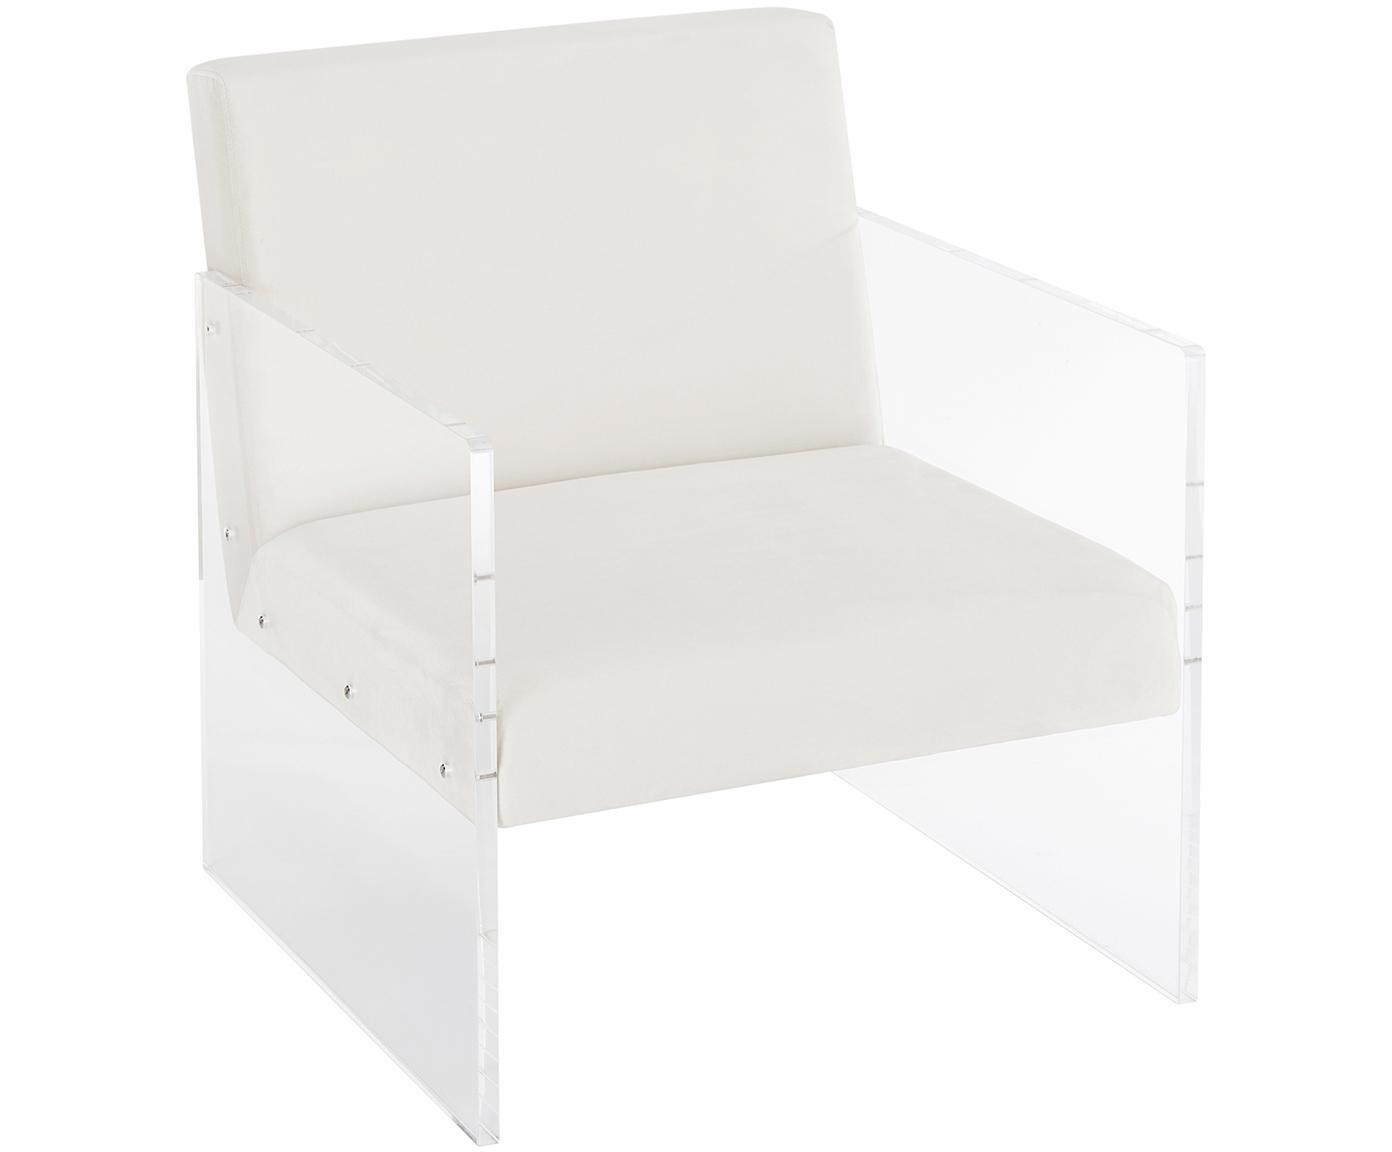 Samt-Loungesessel Ayden, Bezug: Samt (Polyester) 25.000 S, Gestell: Massives Pappelholz, Sper, Beine: Acrylglas, Samt Beige, B 64 x T 74 cm